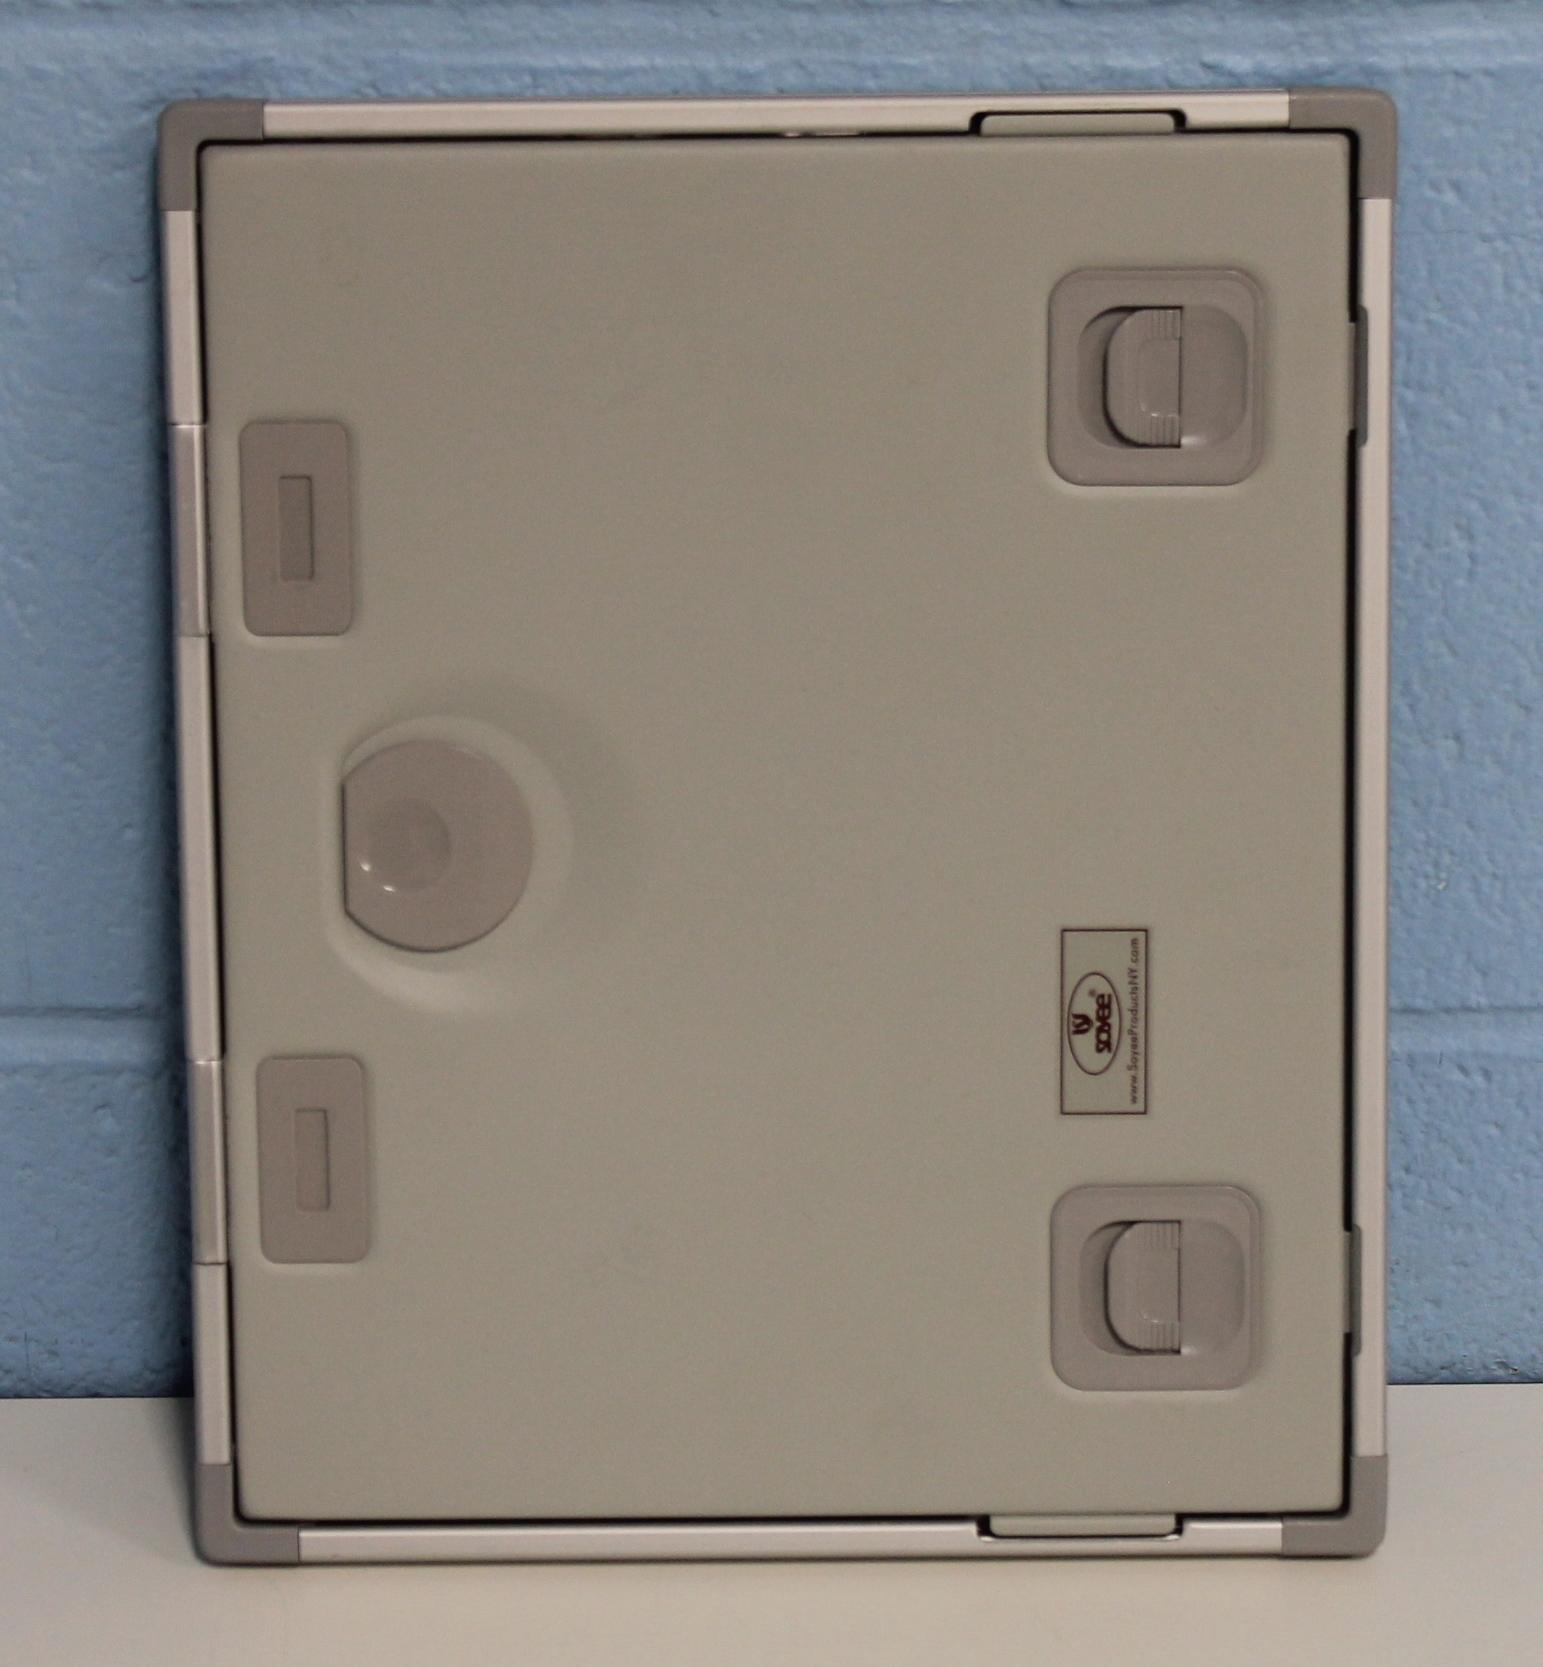 Soyee Aluminum Push Button X-ray Cassette - 8x10 Image